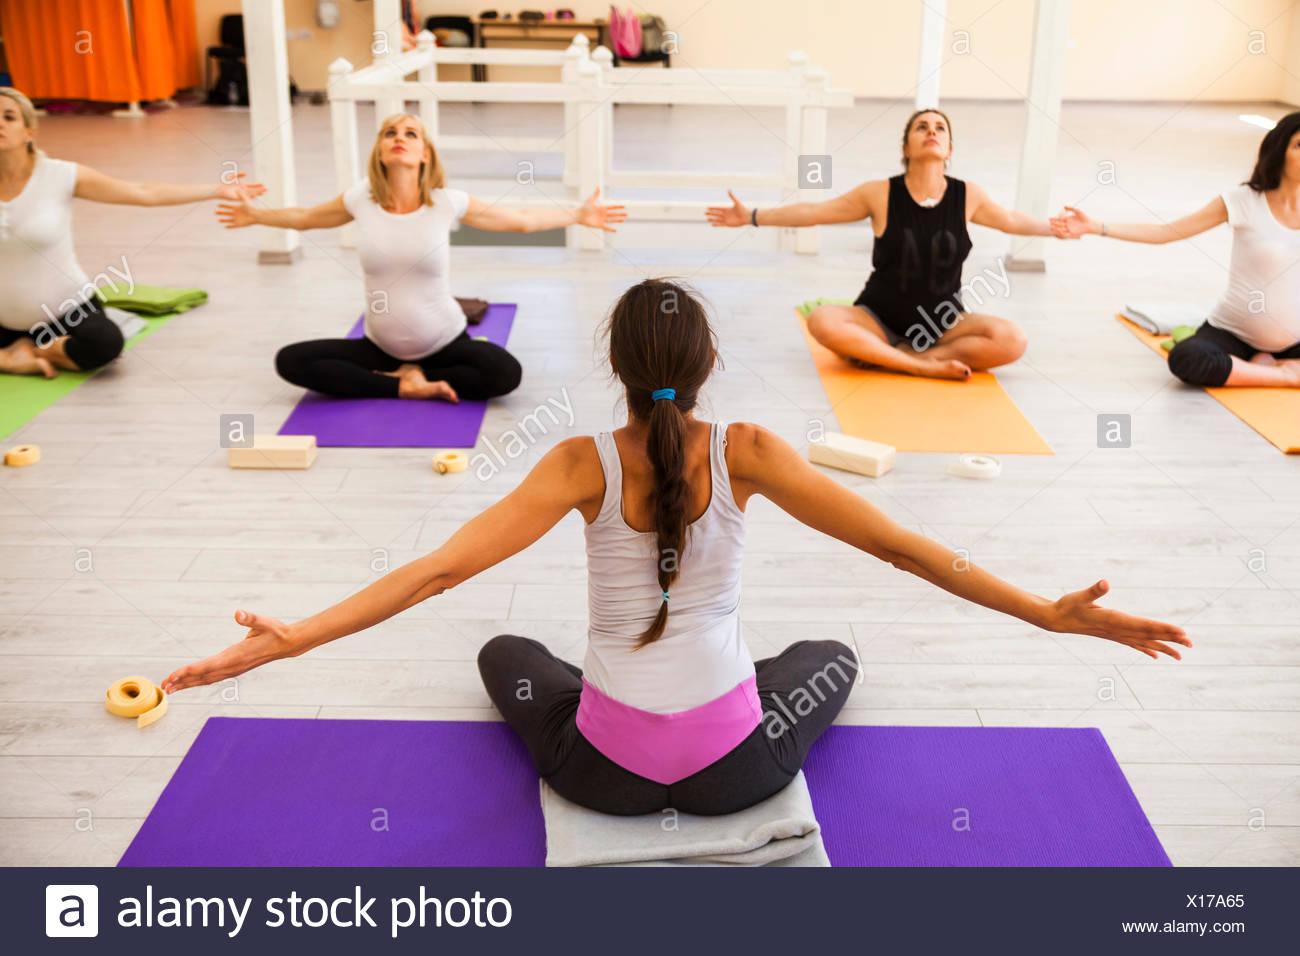 Prenatal yoga class - Stock Image